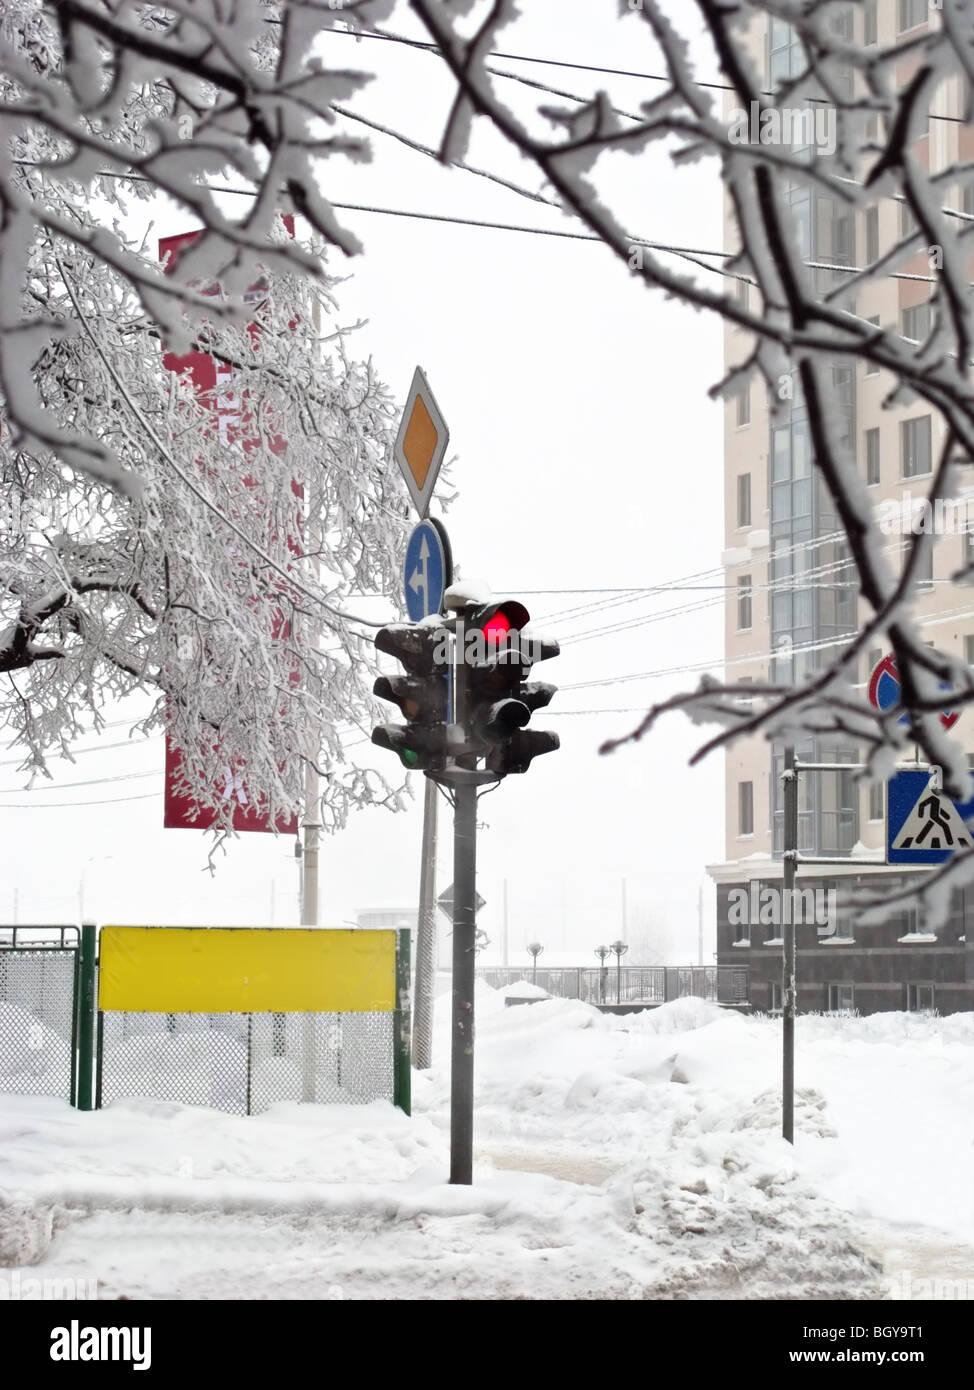 Winter stoplight - Stock Image